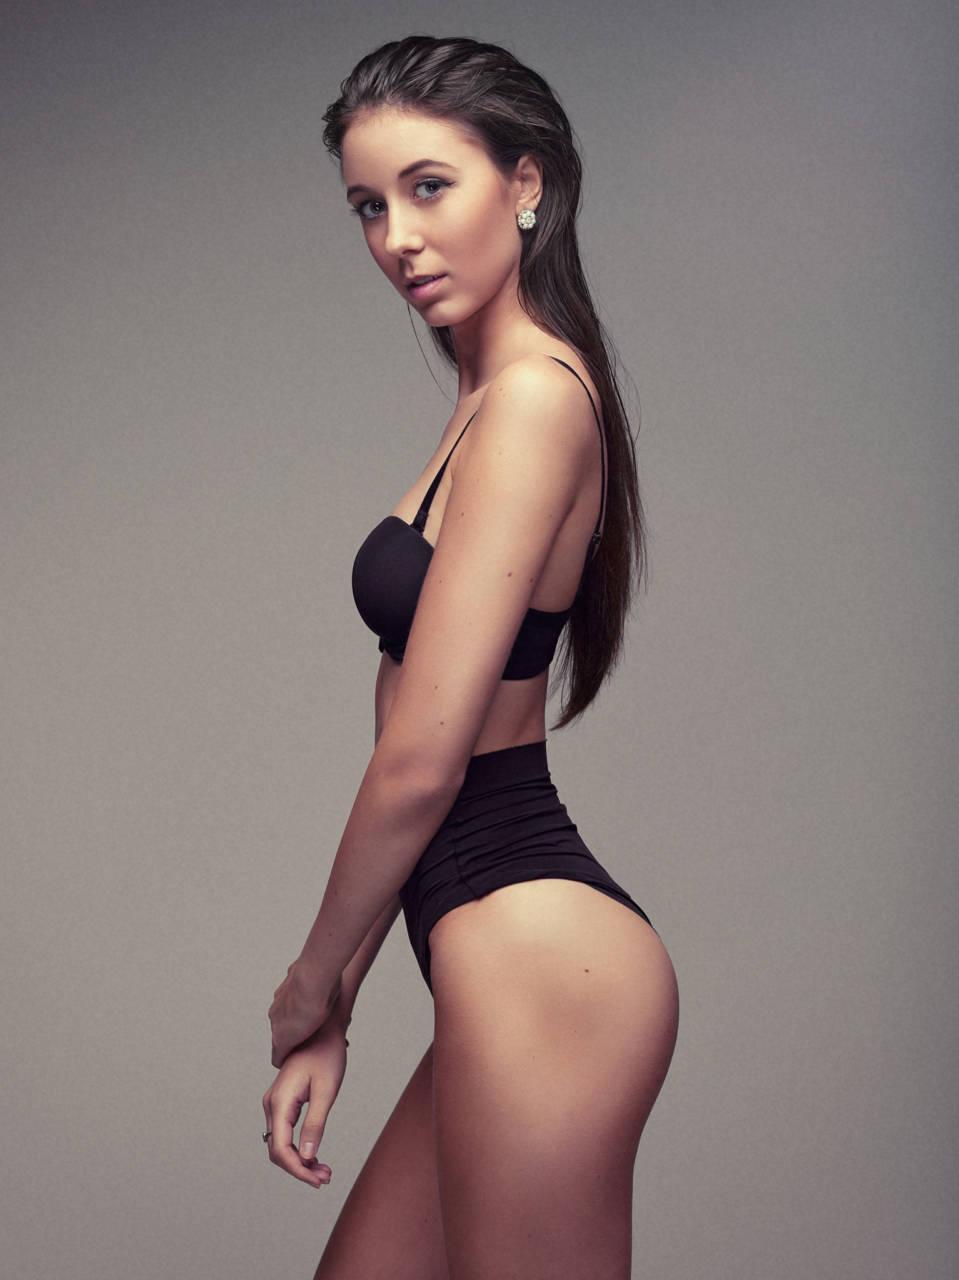 Model : Kim Deloncle